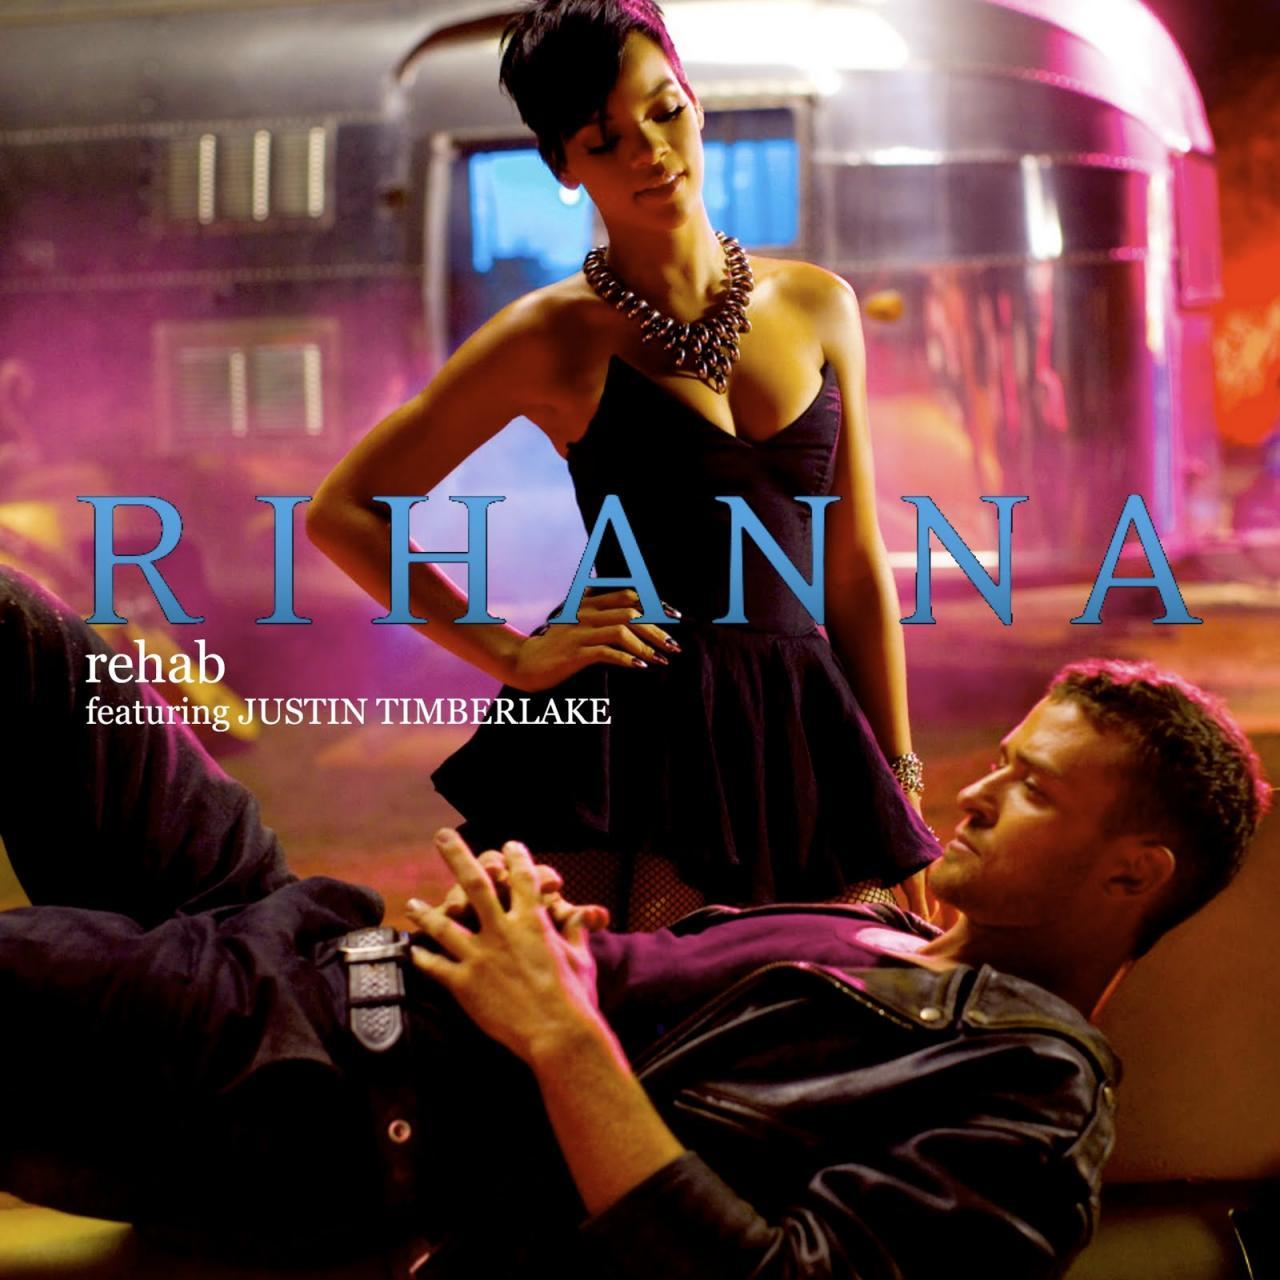 Rihanna Ft. Justin Timberlake - Rehab mp3 download